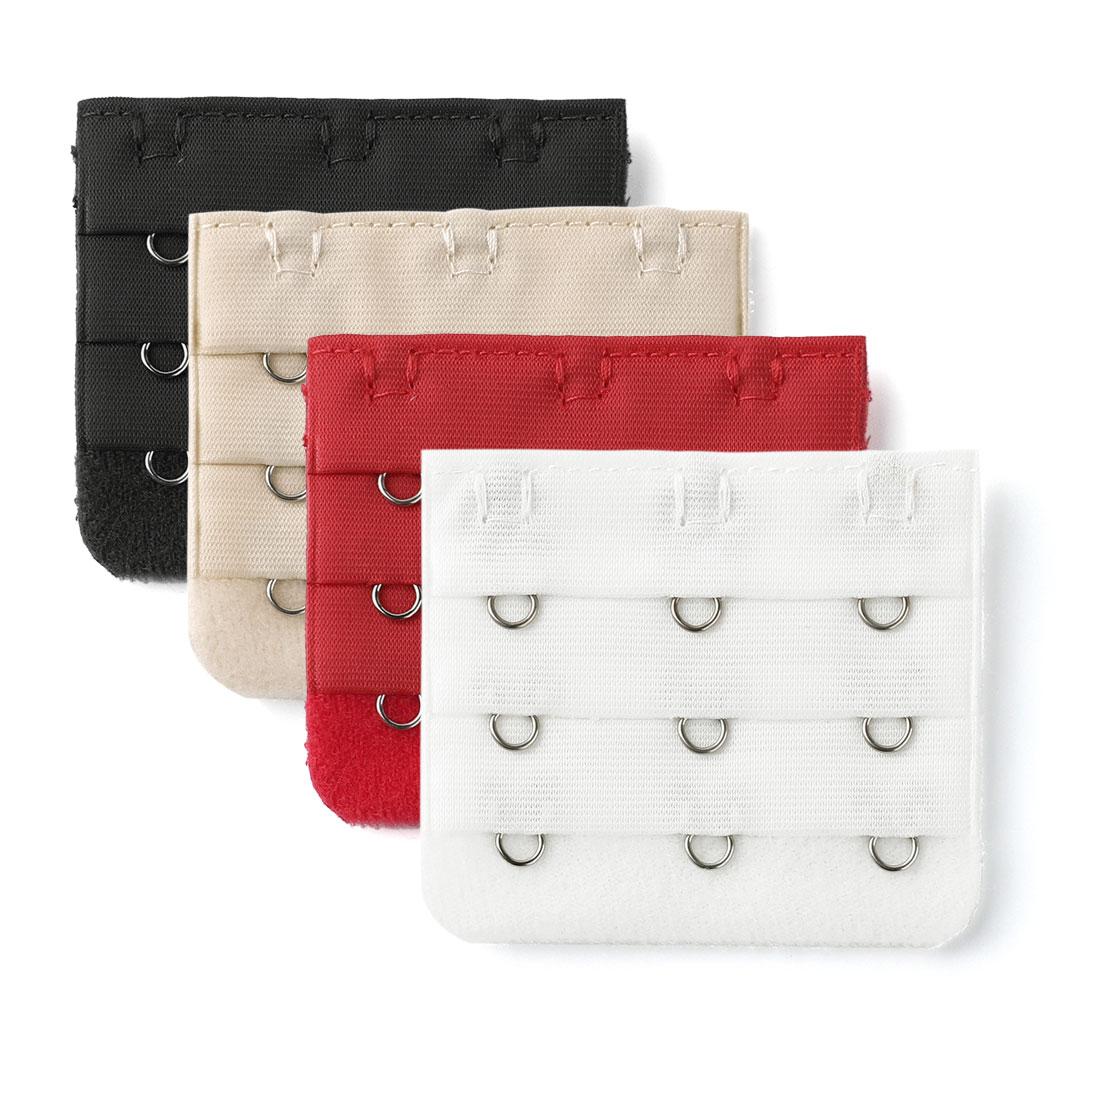 Woman 3 Rows 3 Hooks Brassiere Bra Extension Strap Extender Multicolor 4pcs